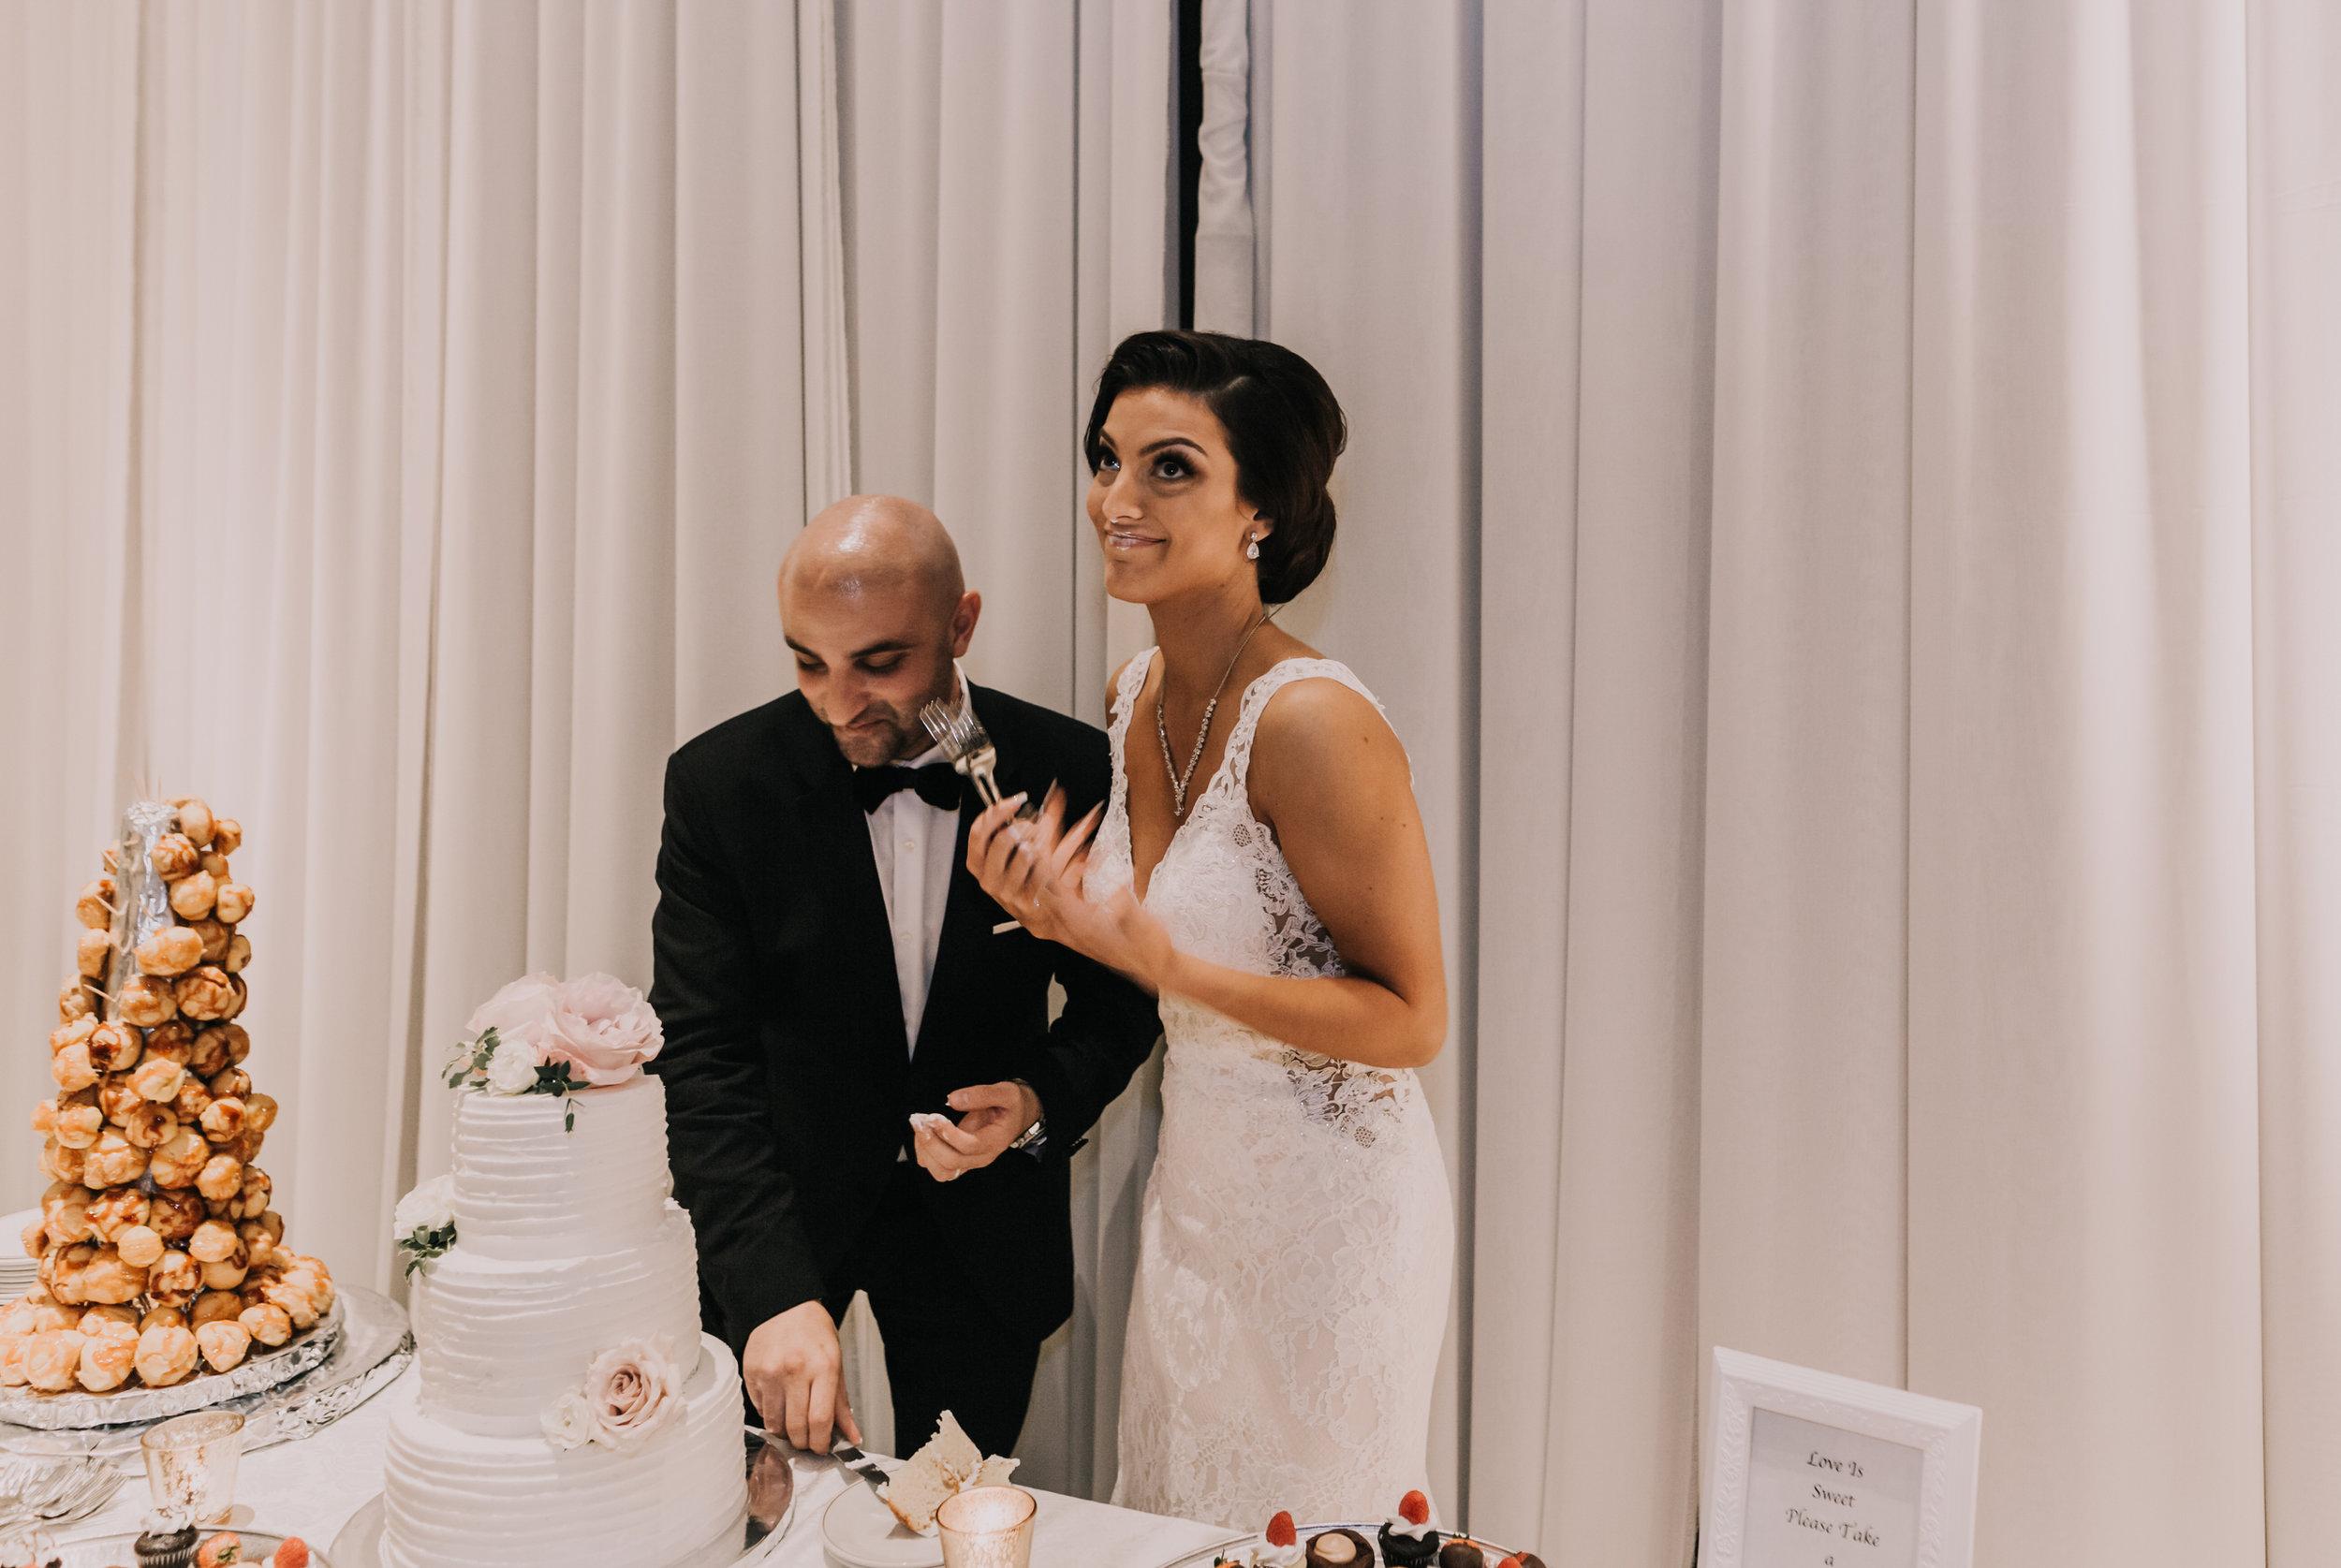 Pitt Meadows Wedding Photographer - Sky Hangar Wedding Photos - Vancouver Wedding Photographer & Videographer - Sunshine Coast Wedding Photos - Sunshine Coast Wedding Photographer - Jennifer Picard Photography - IMG_6548.jpg